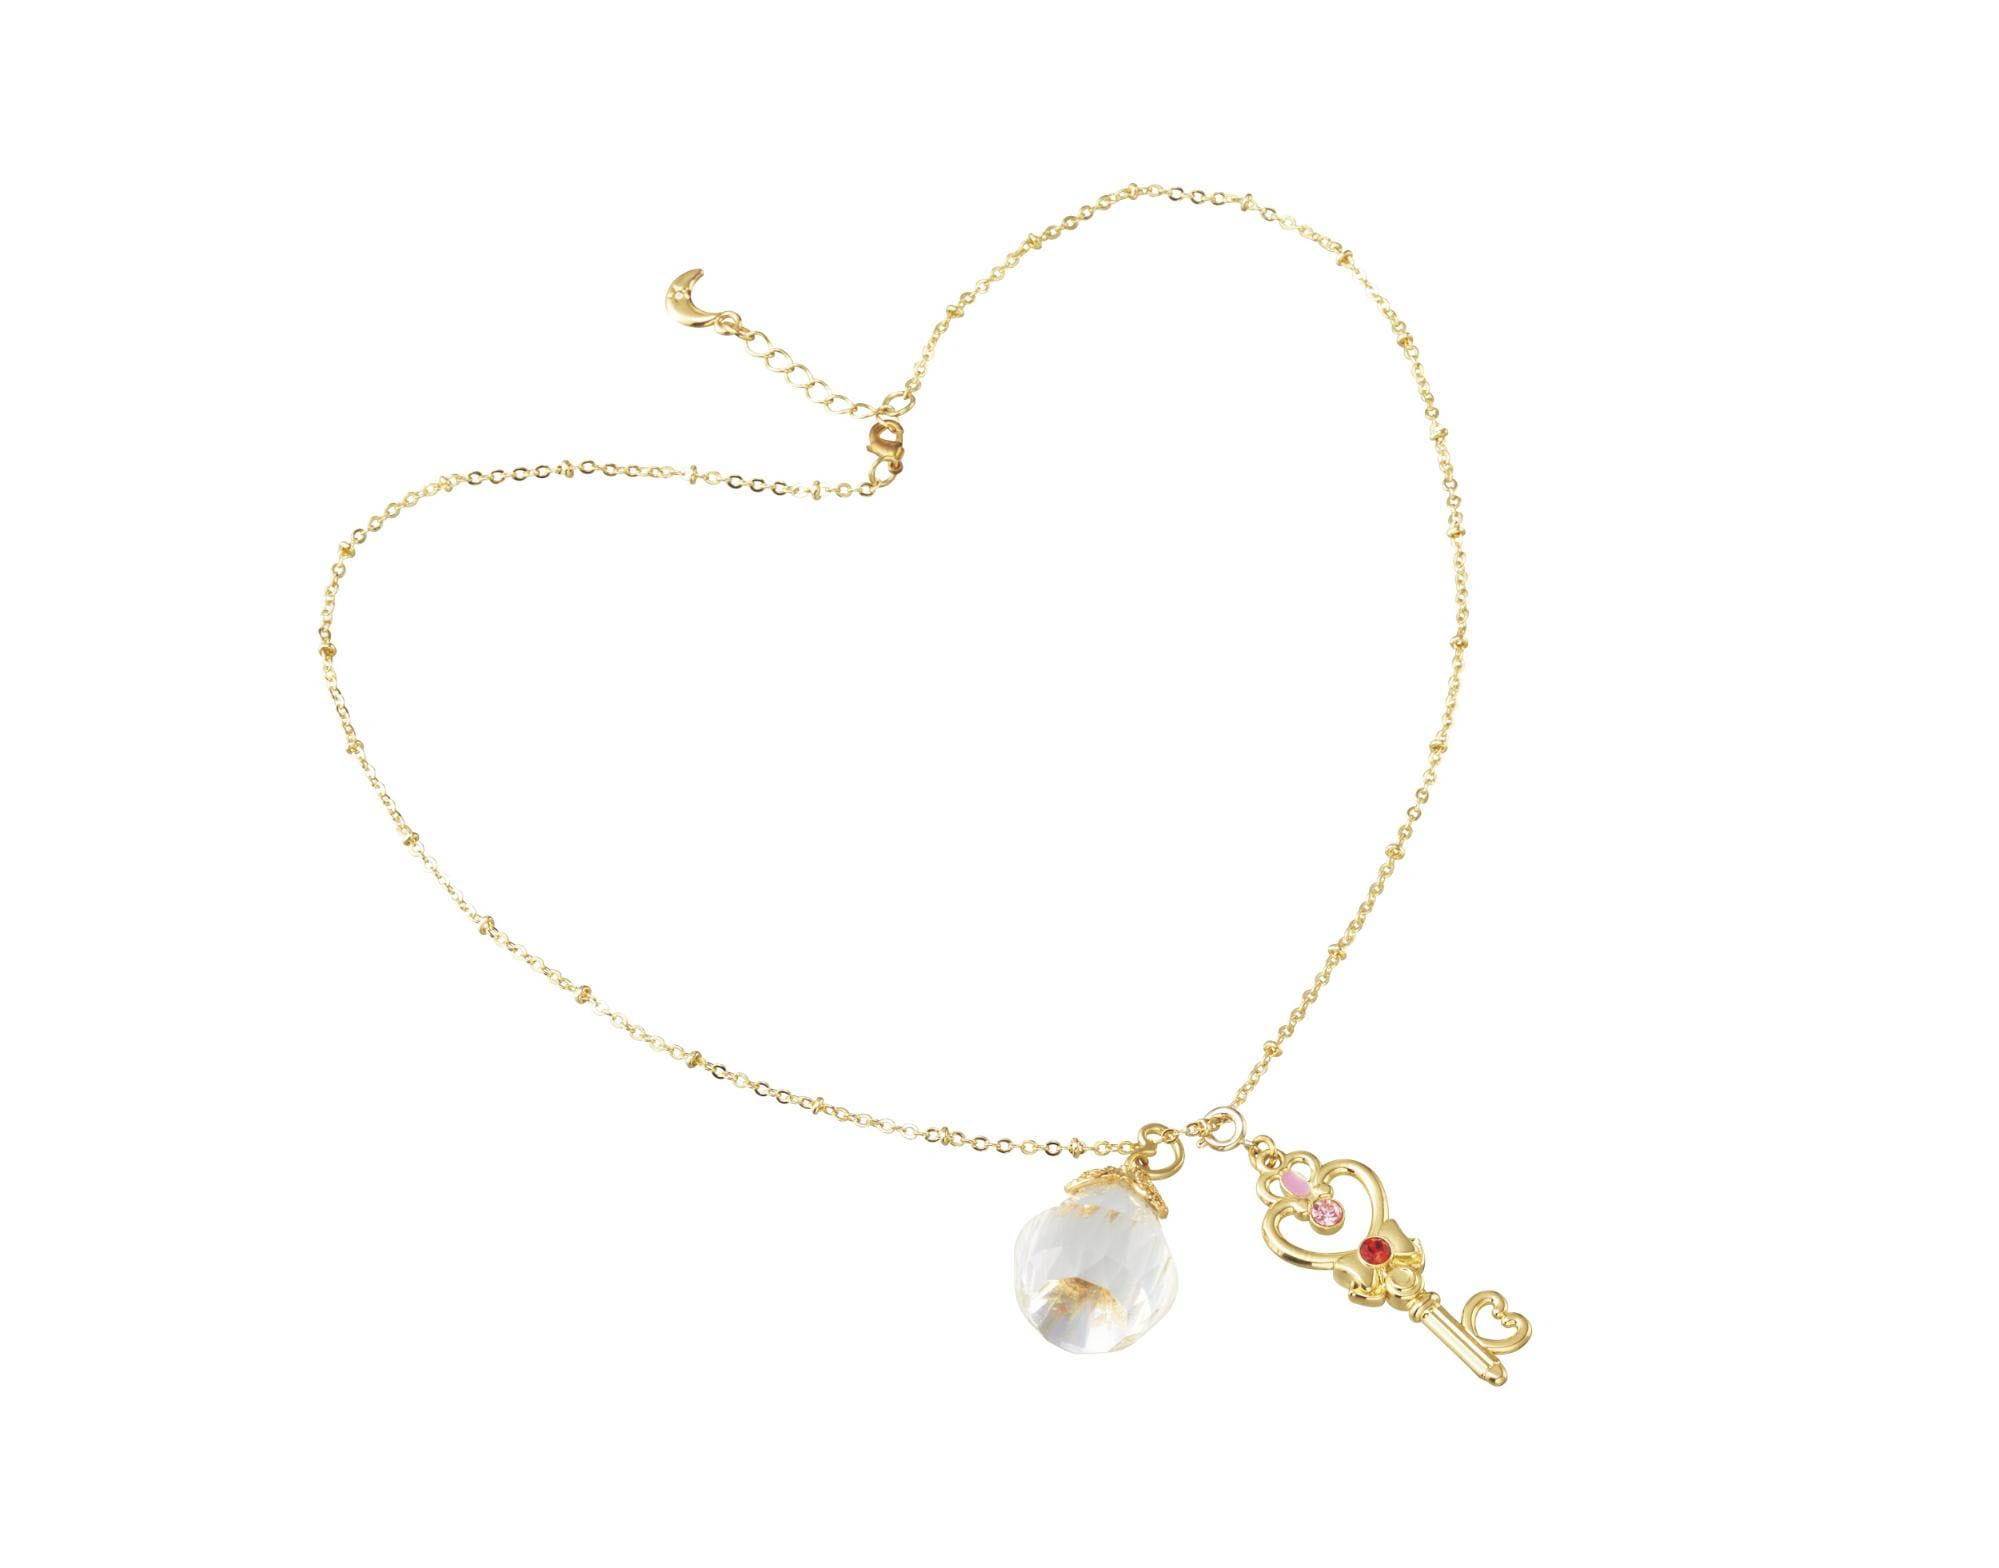 Sailor Moon gold necklace